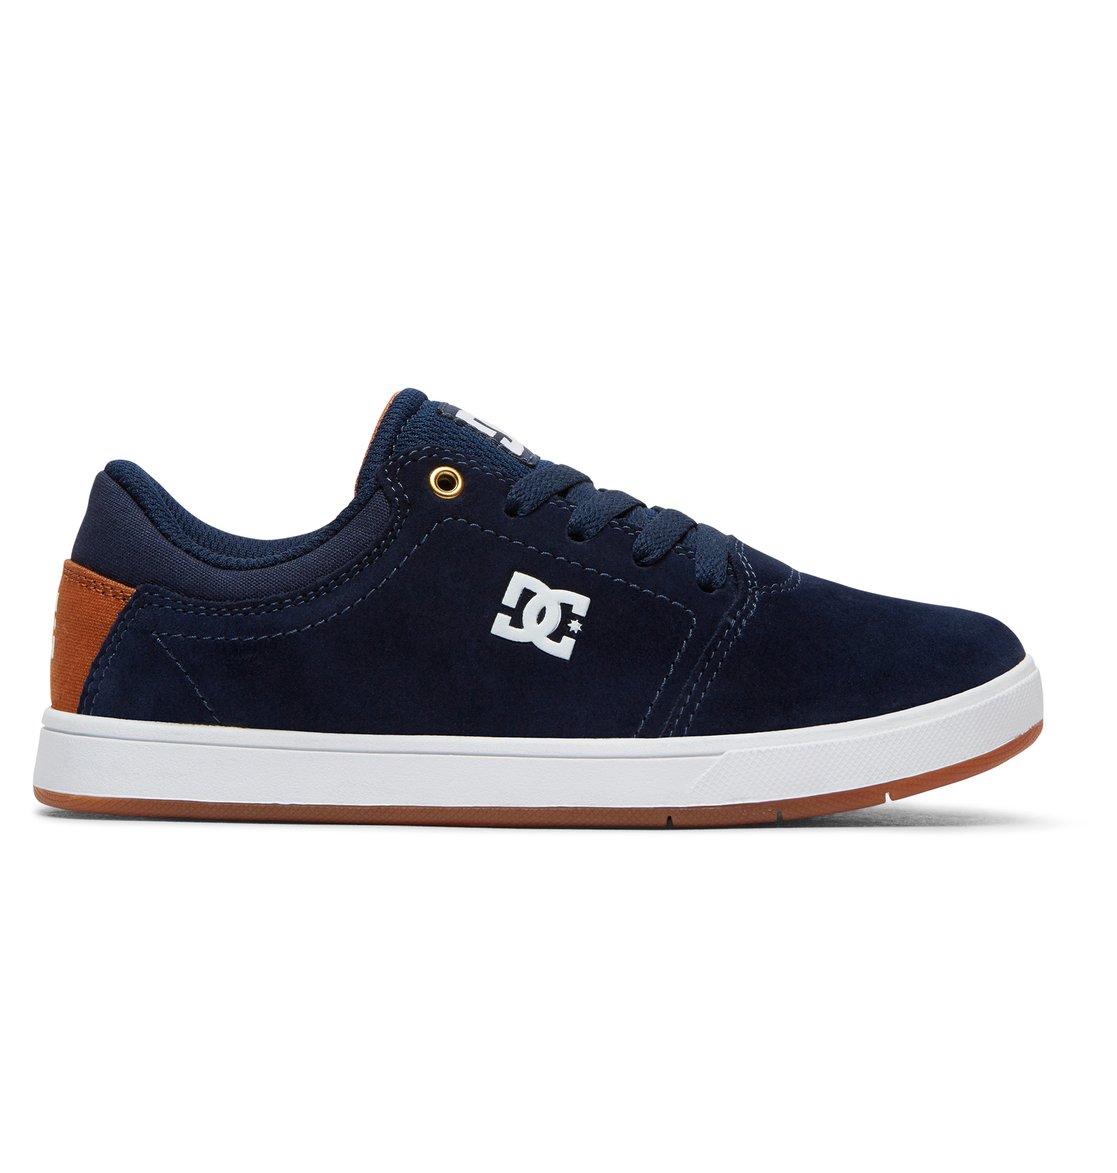 Dc Shoes Gar Taille